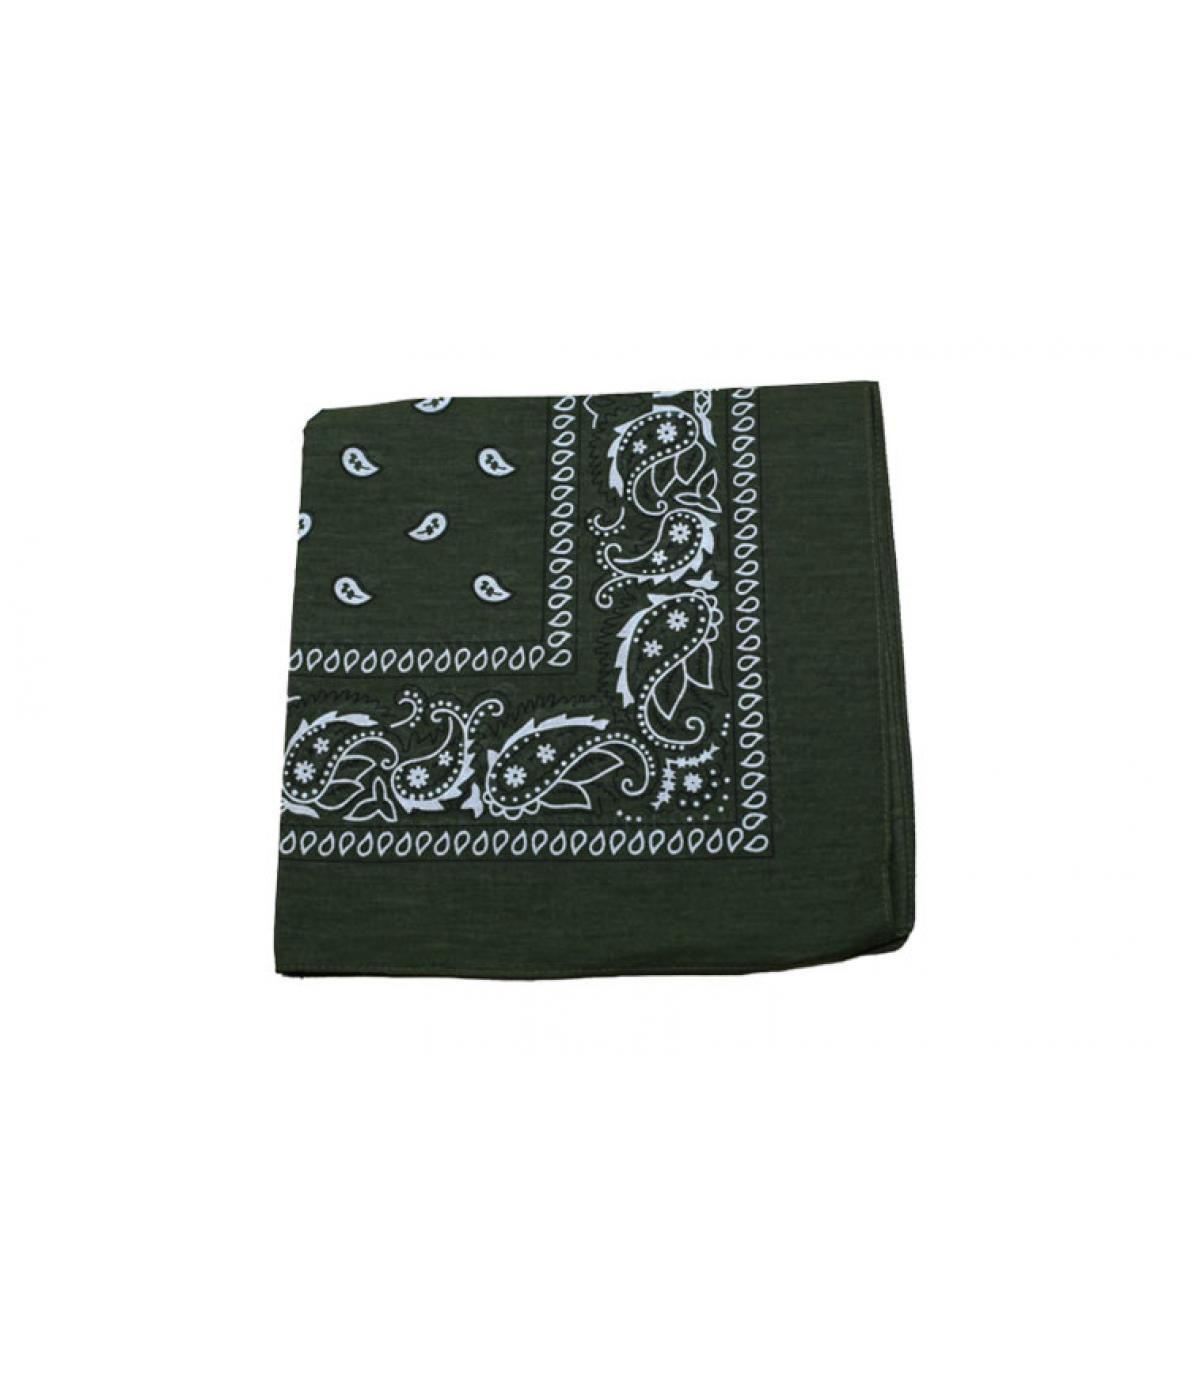 Khaki-green bandana